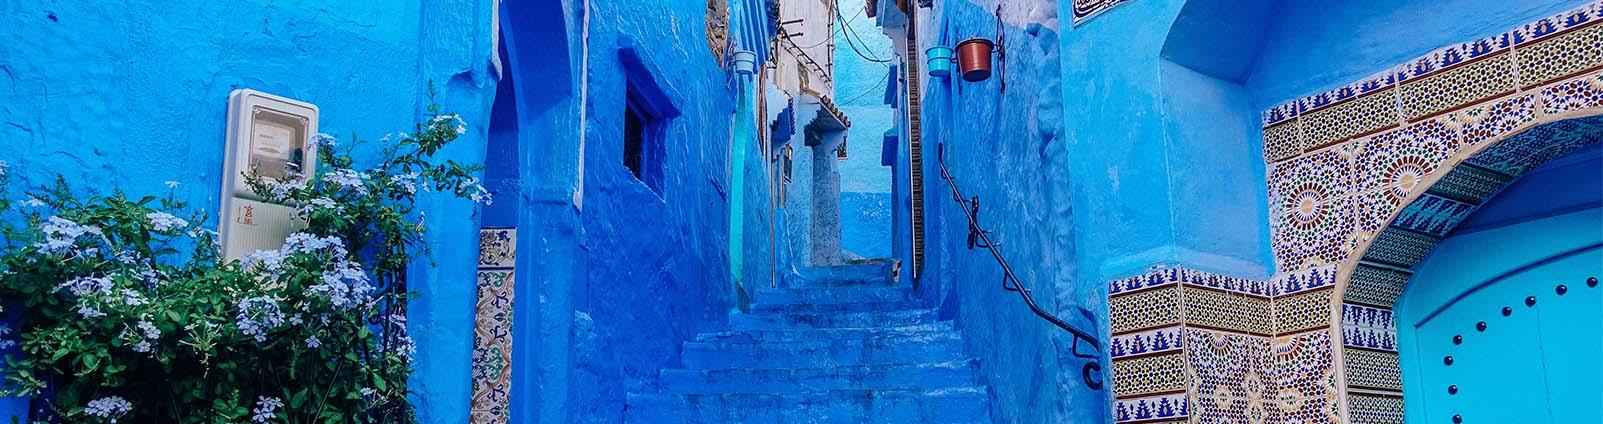 Terres et voyages, agence de voyage Maroc